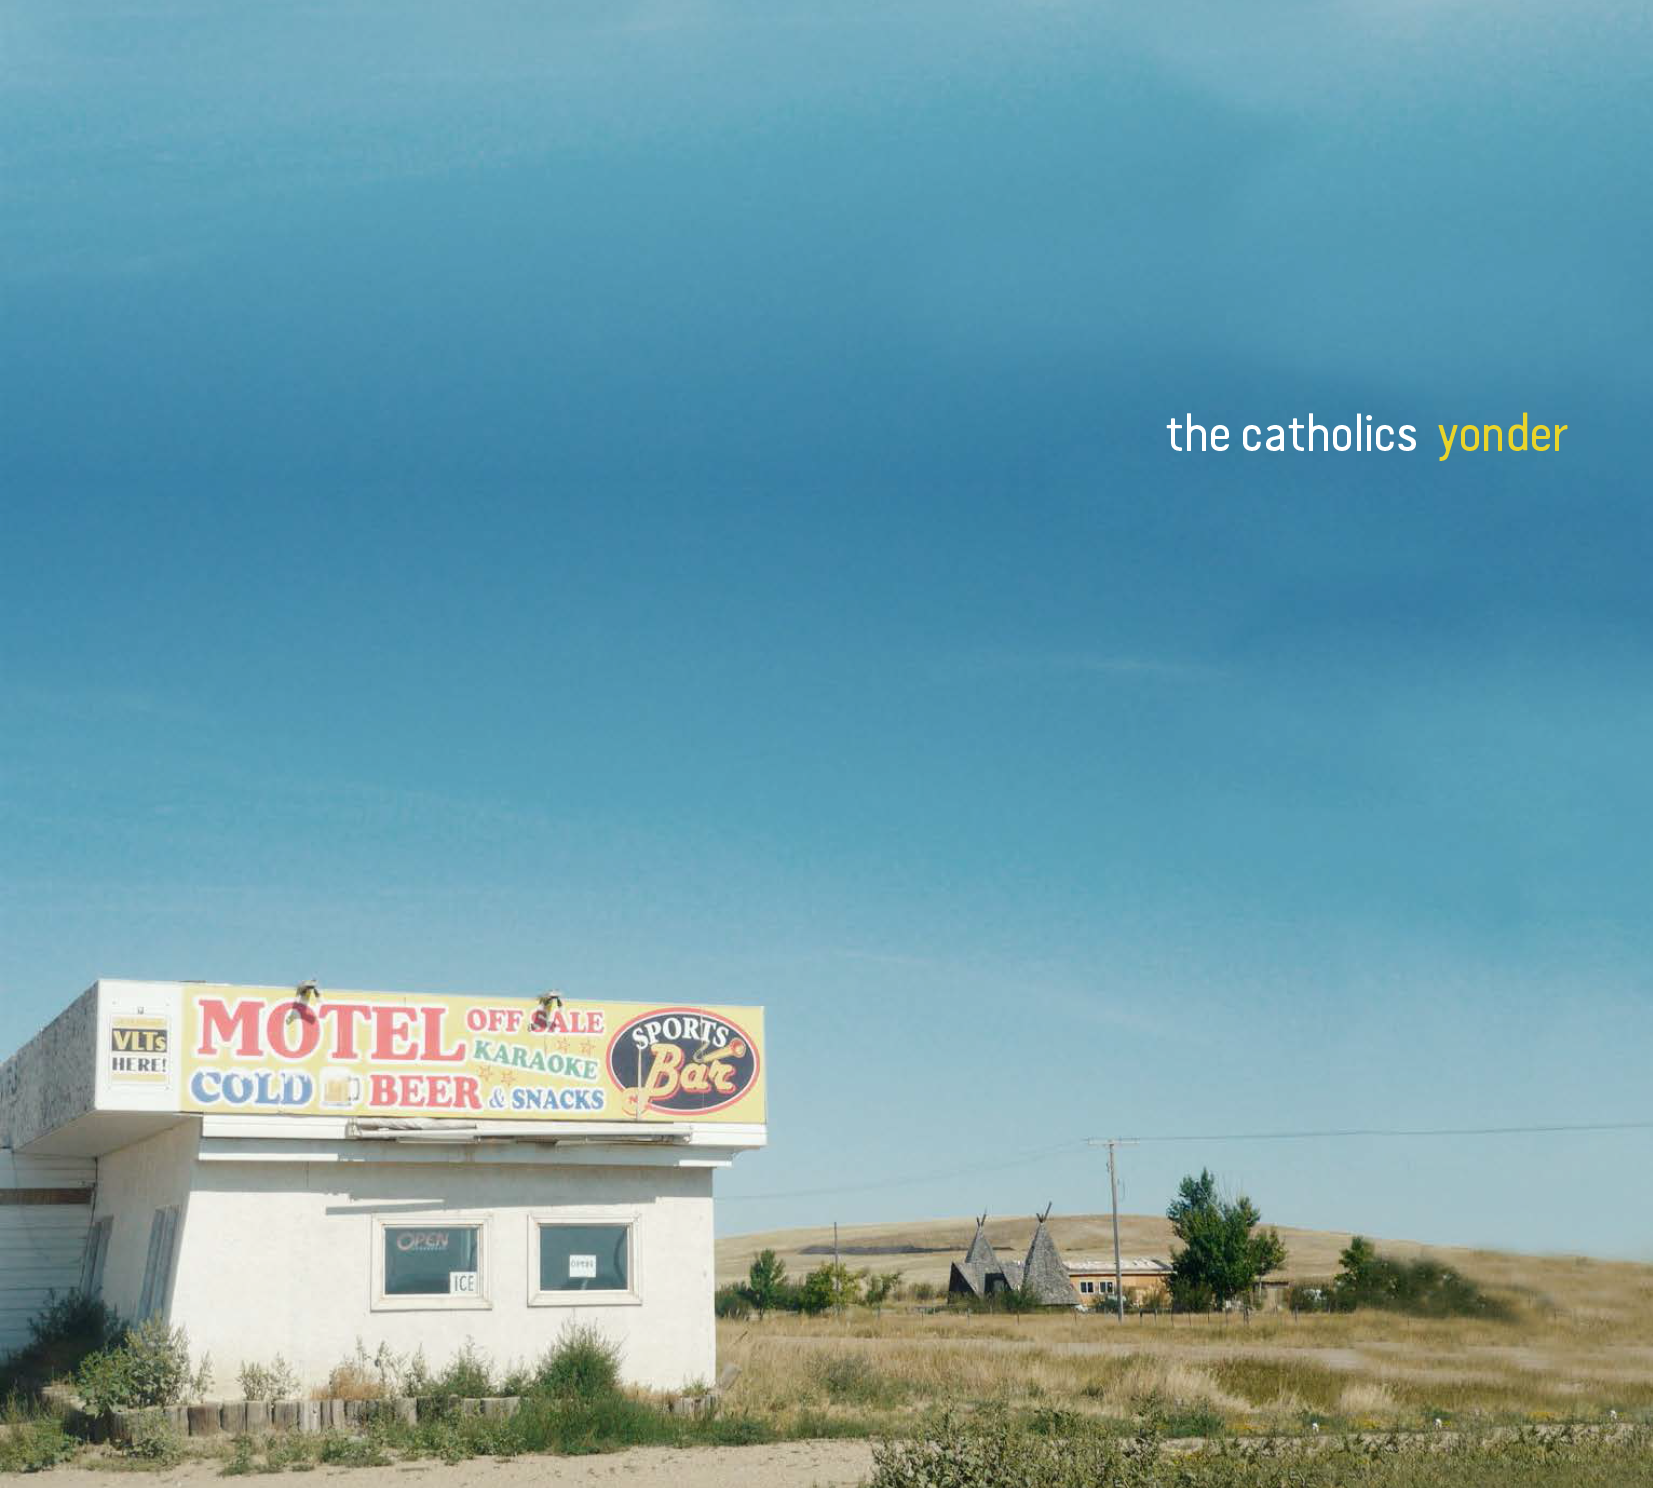 Album Review: Yonder (The catholics)